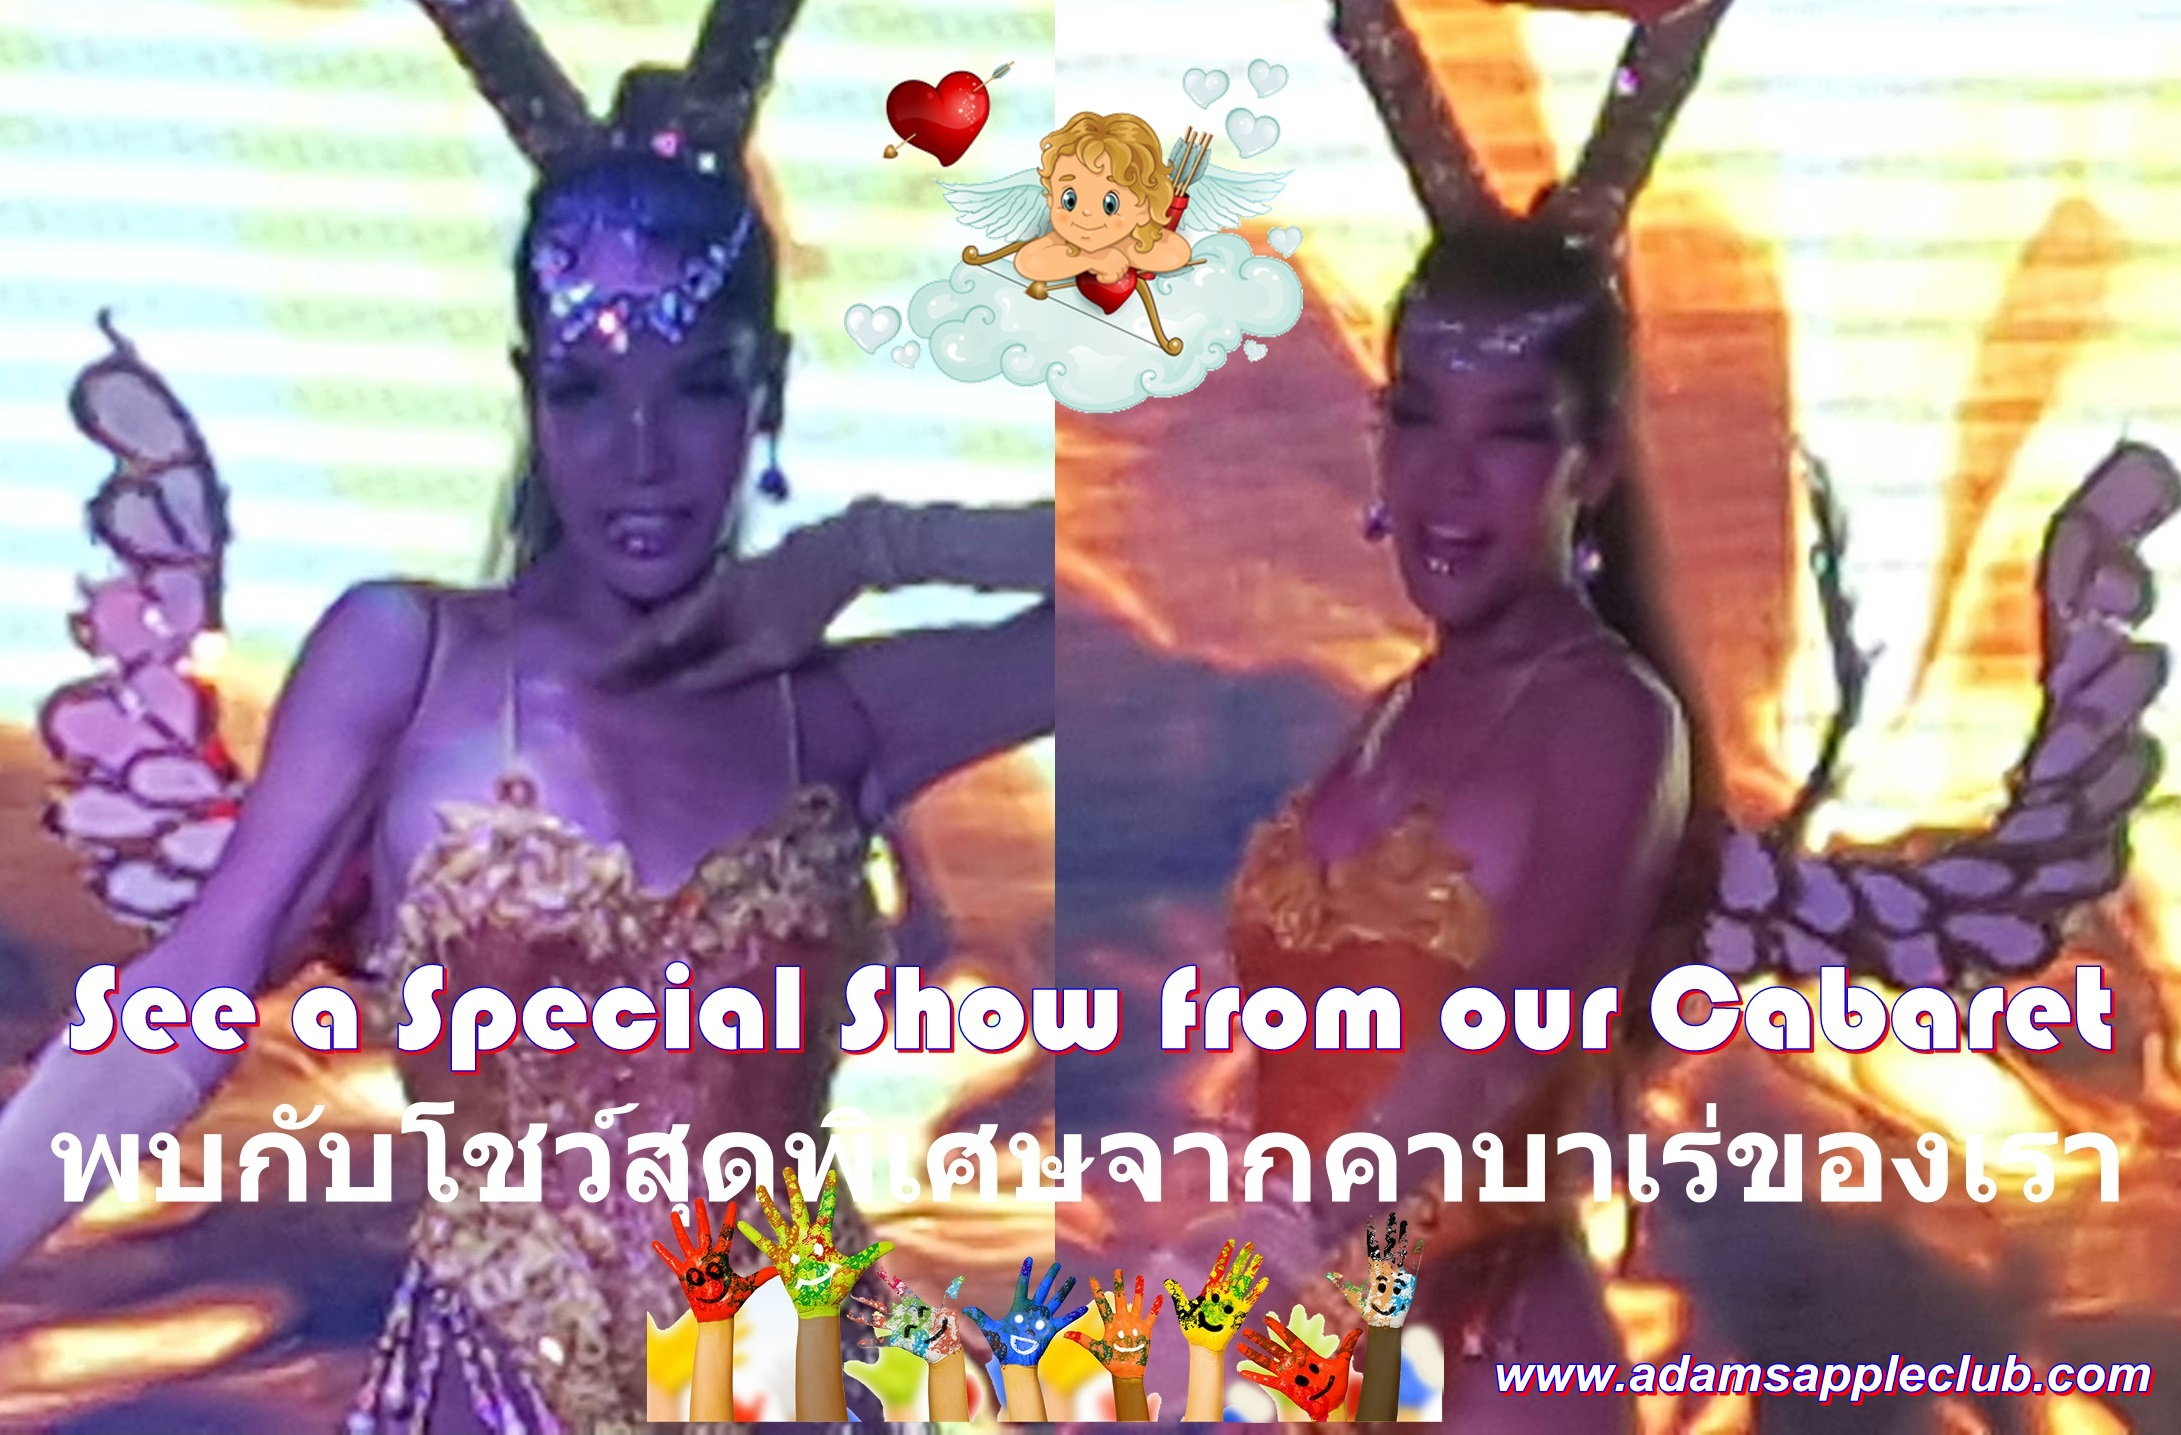 Adams Apple Club Special Cabaret Show